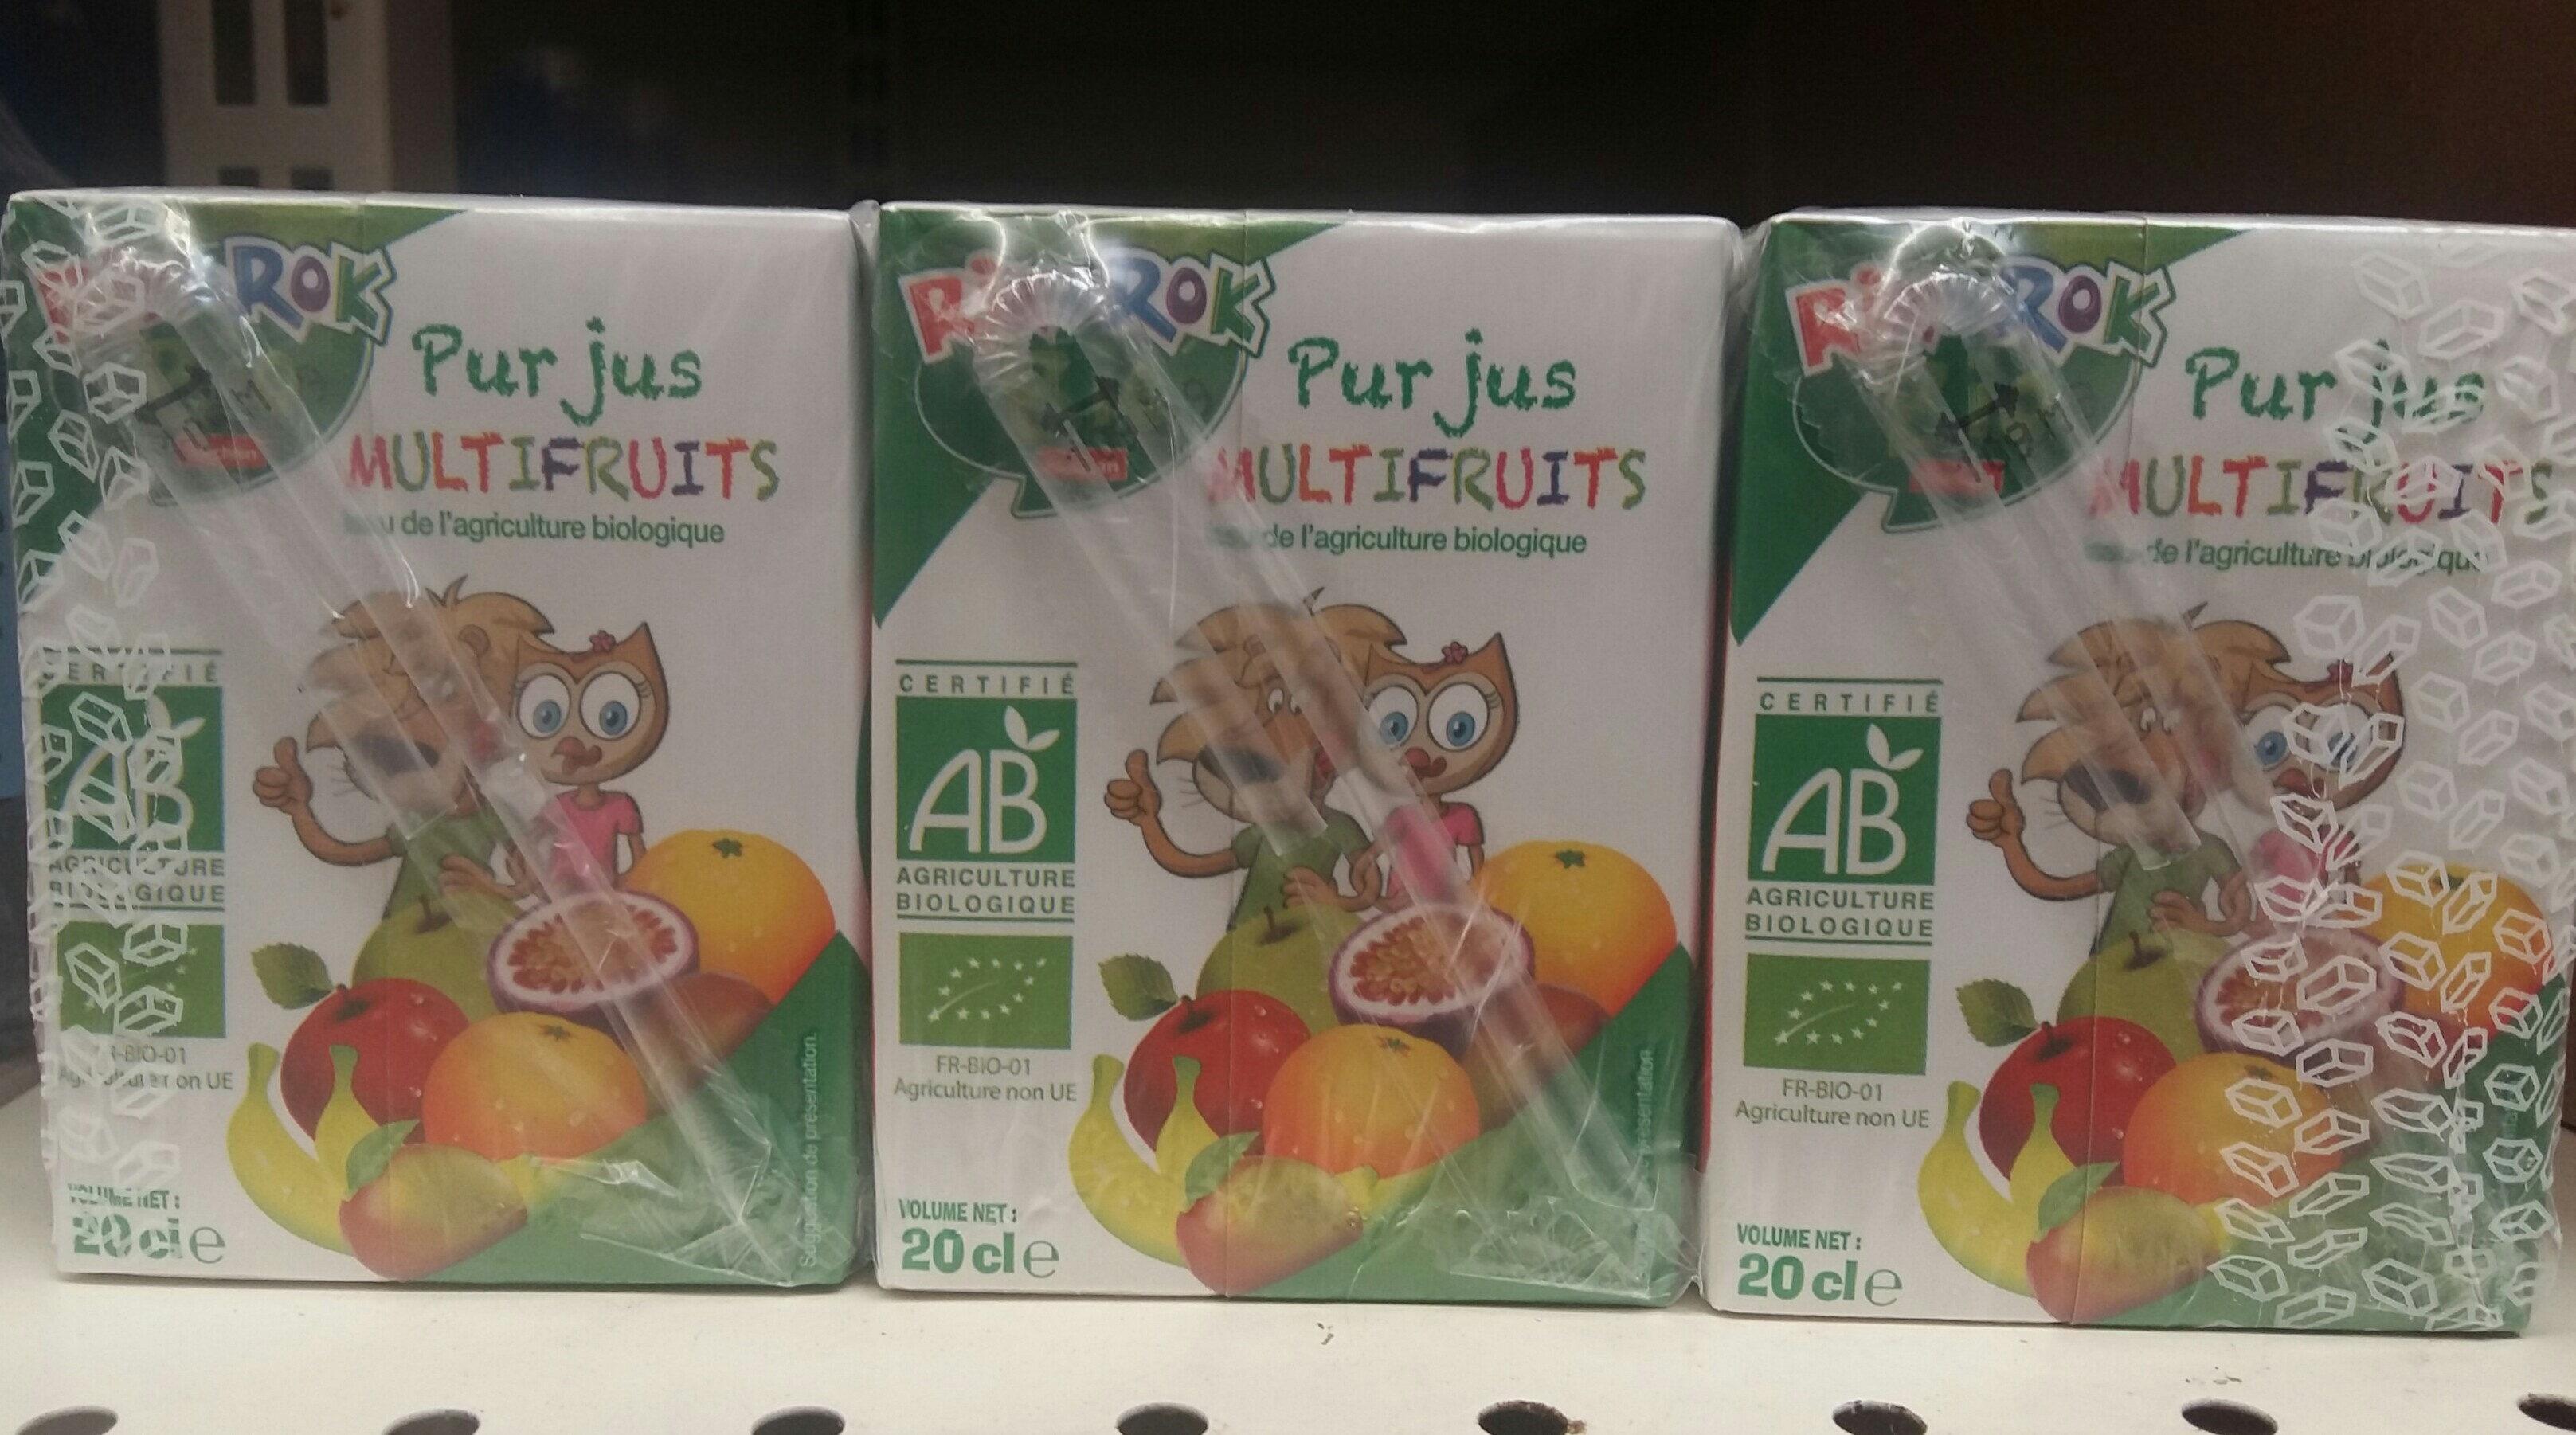 Rik & Rok bio pur jus multifruits - Product - fr